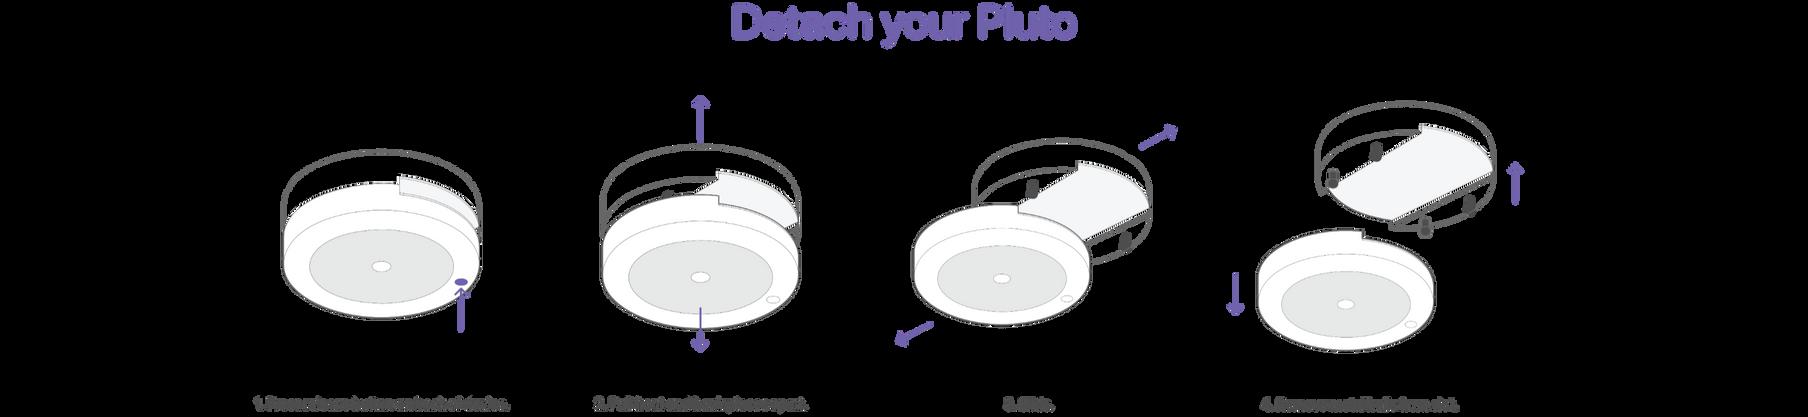 Pluto%20Manual-04_edited.png